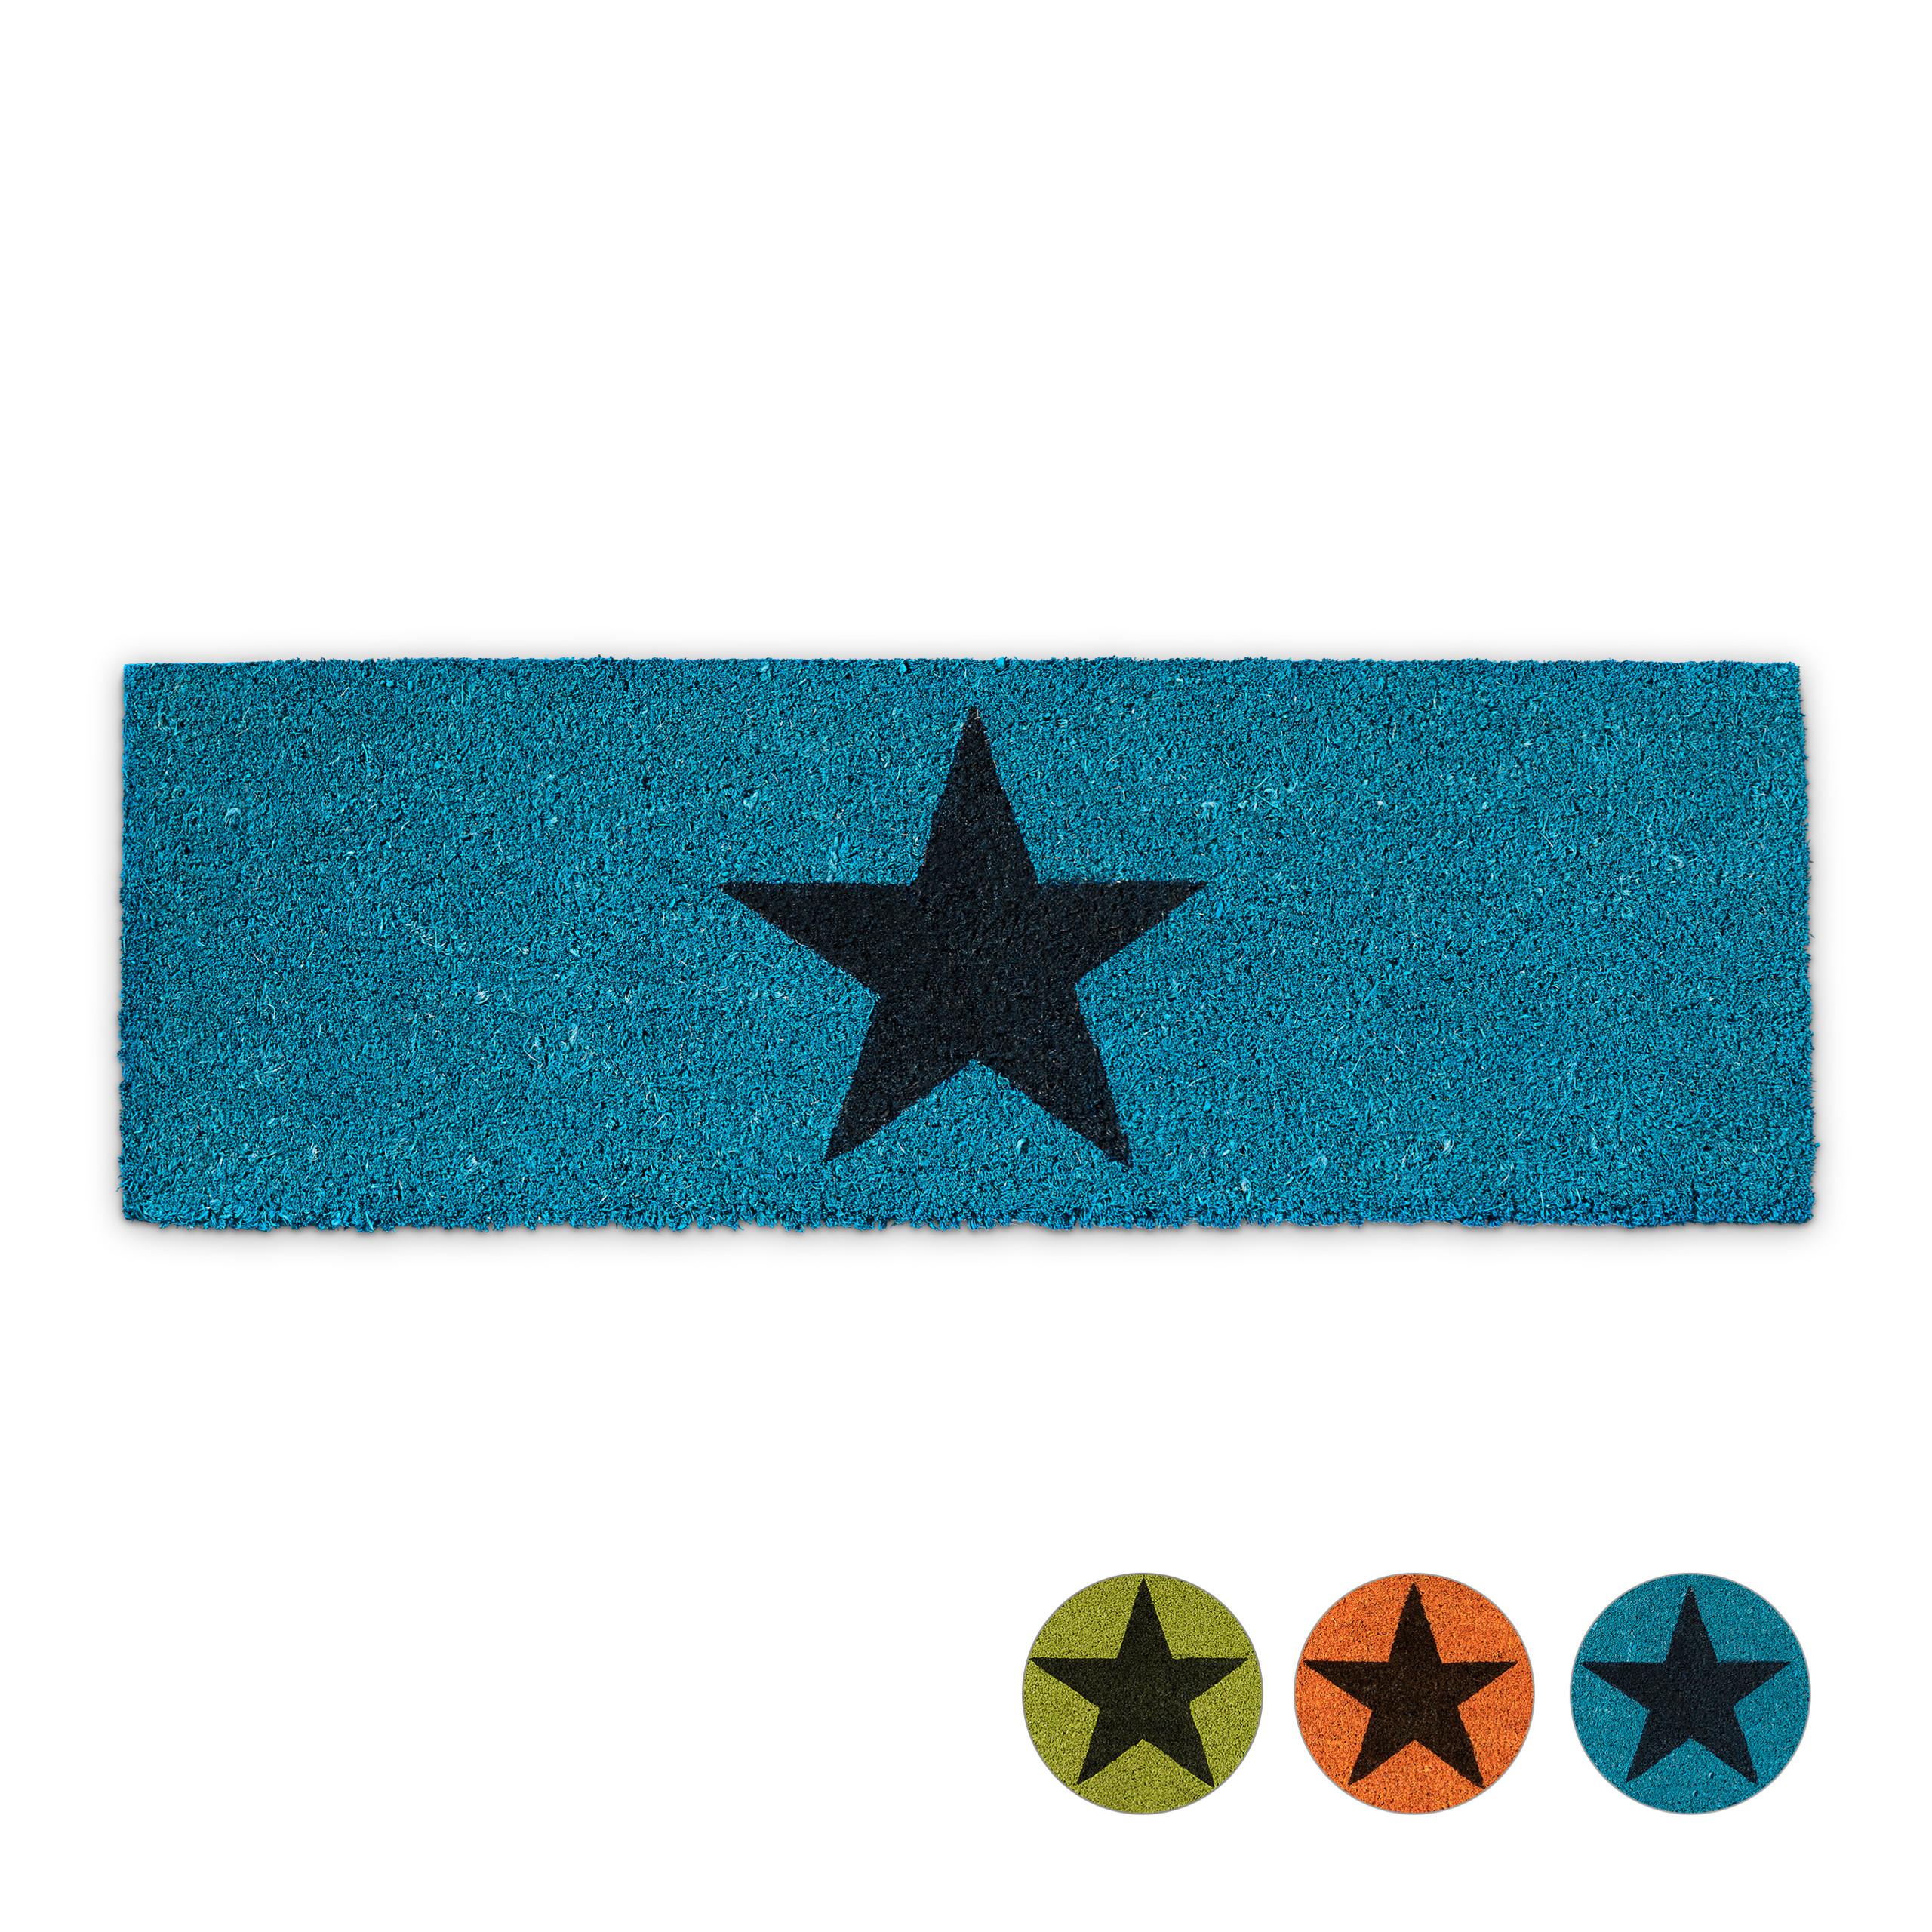 Paillasson-STERN-fibres-de-coco-antiderapant-etoile-vert-bleu-orange-nature